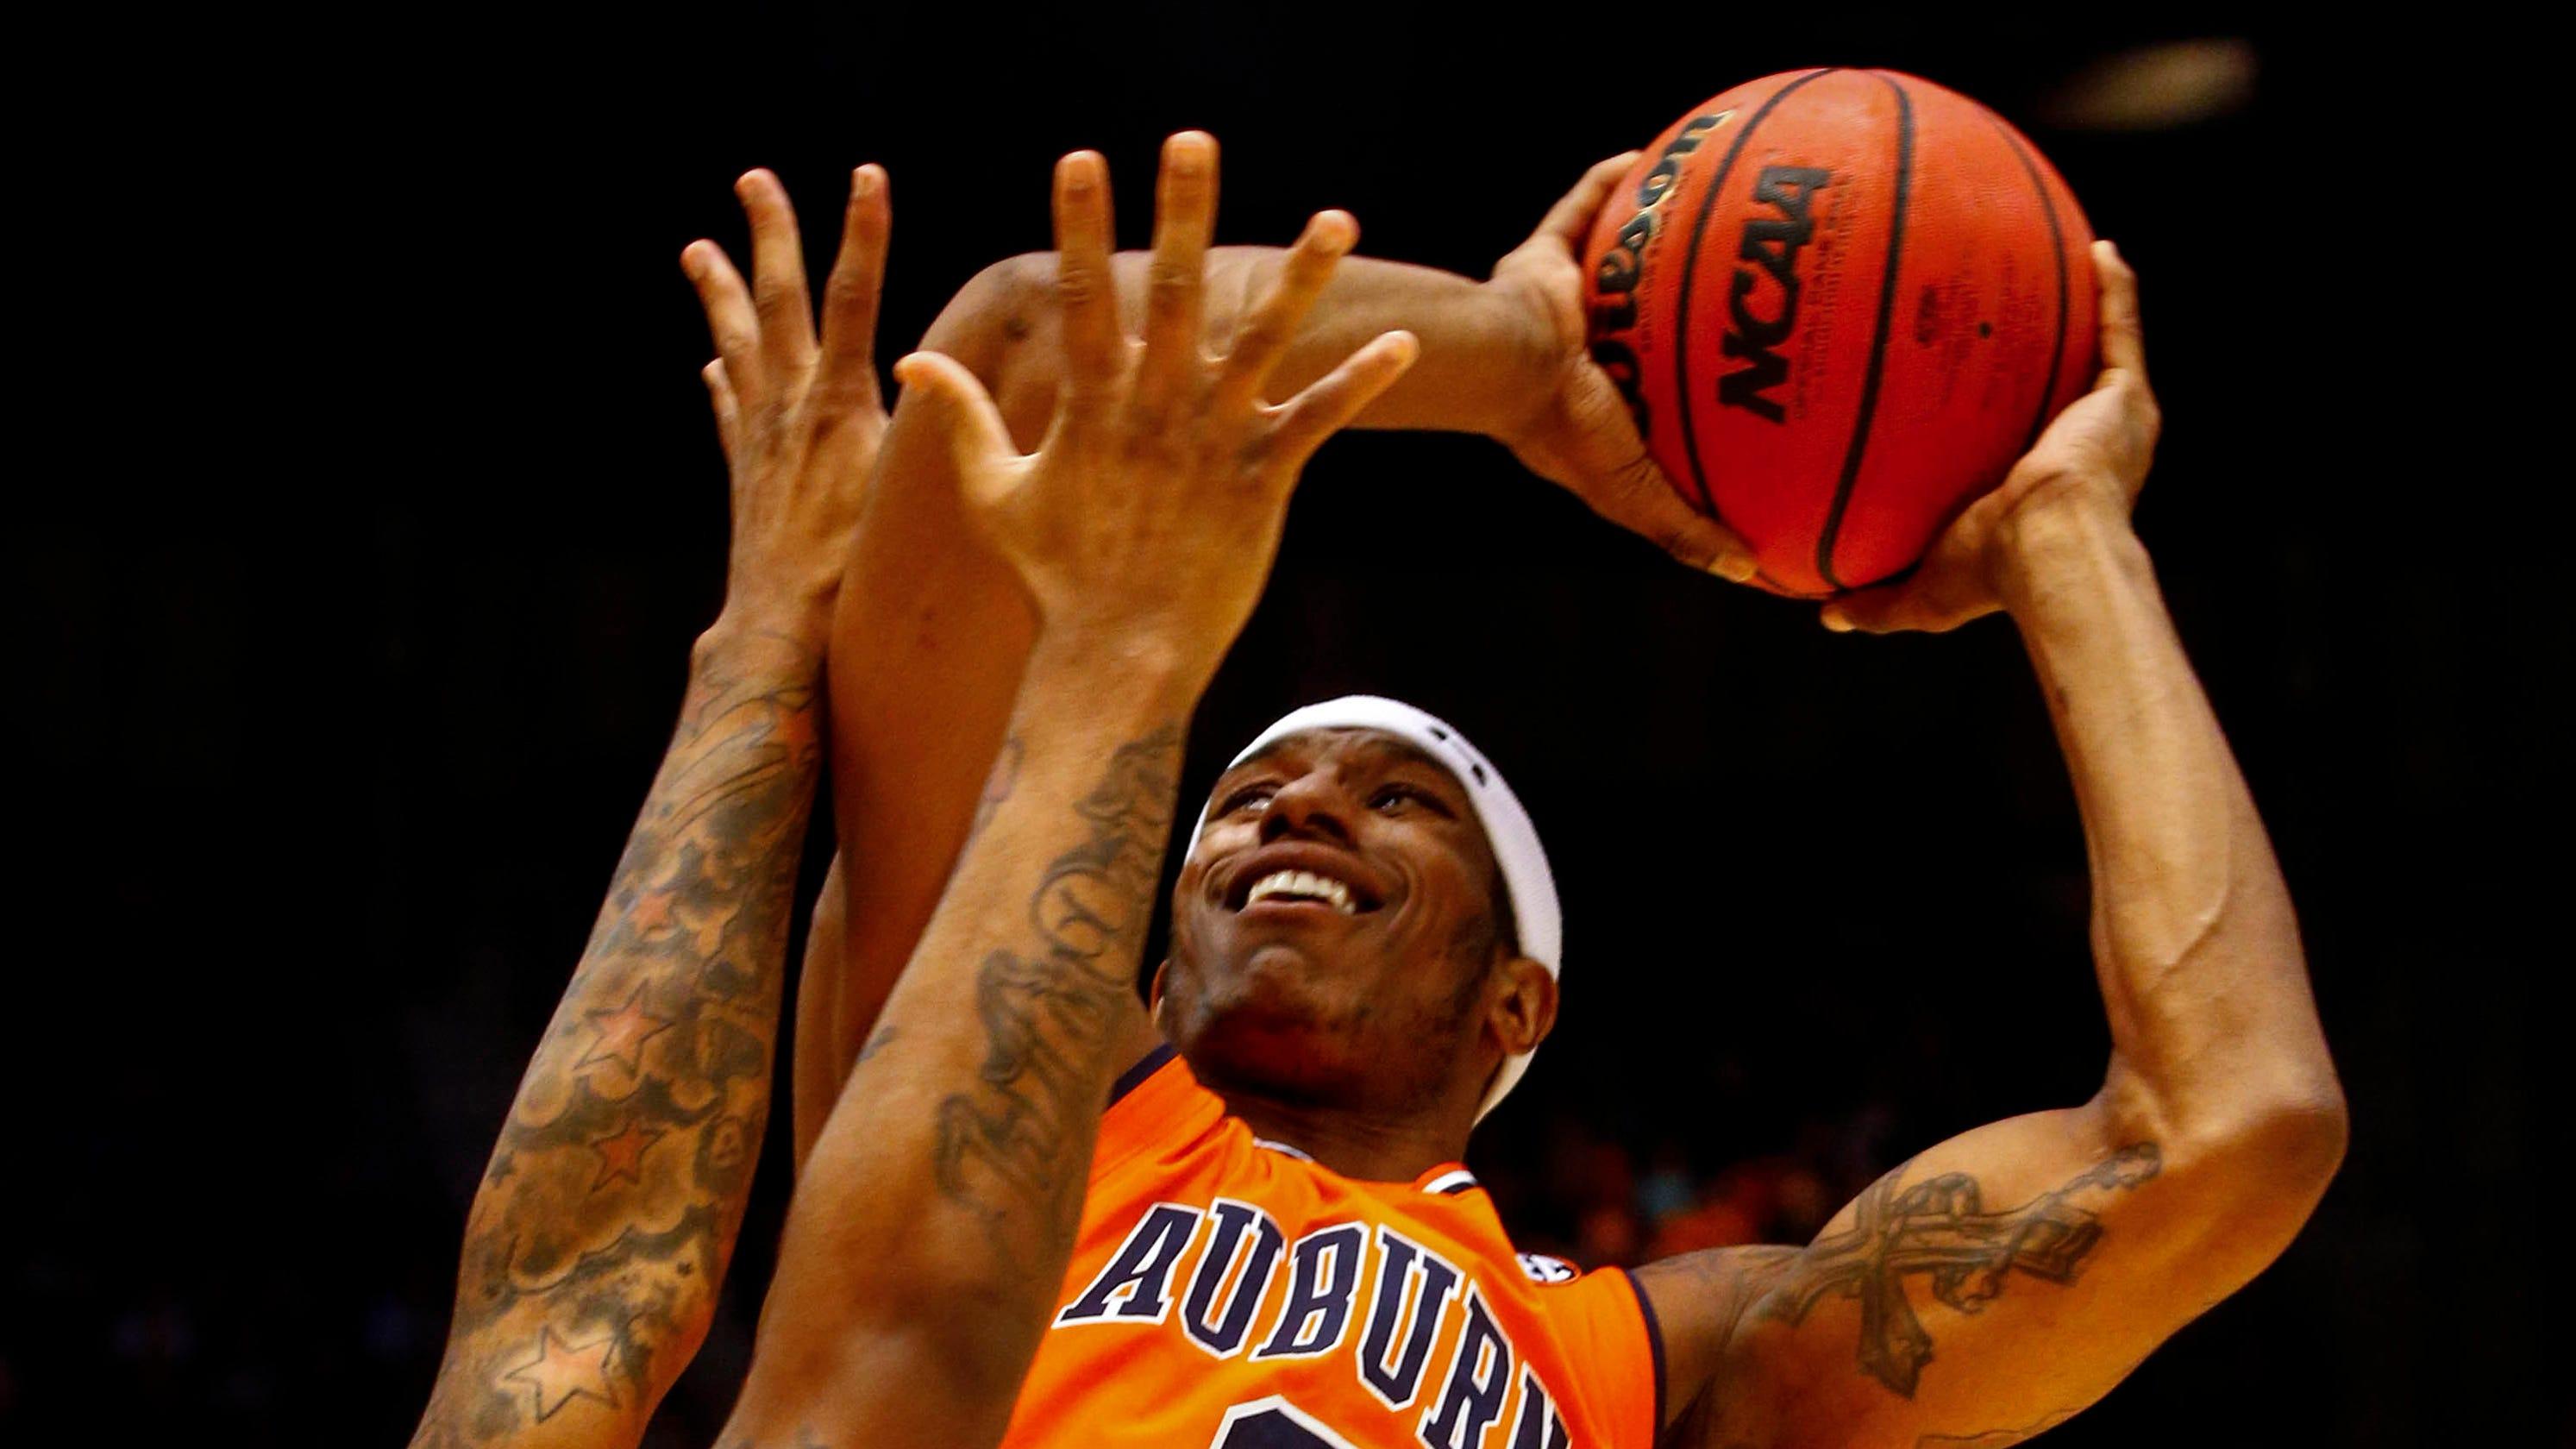 a180bb7592c4 A look at Auburn vs. UAB men s basketball on Dec. 15